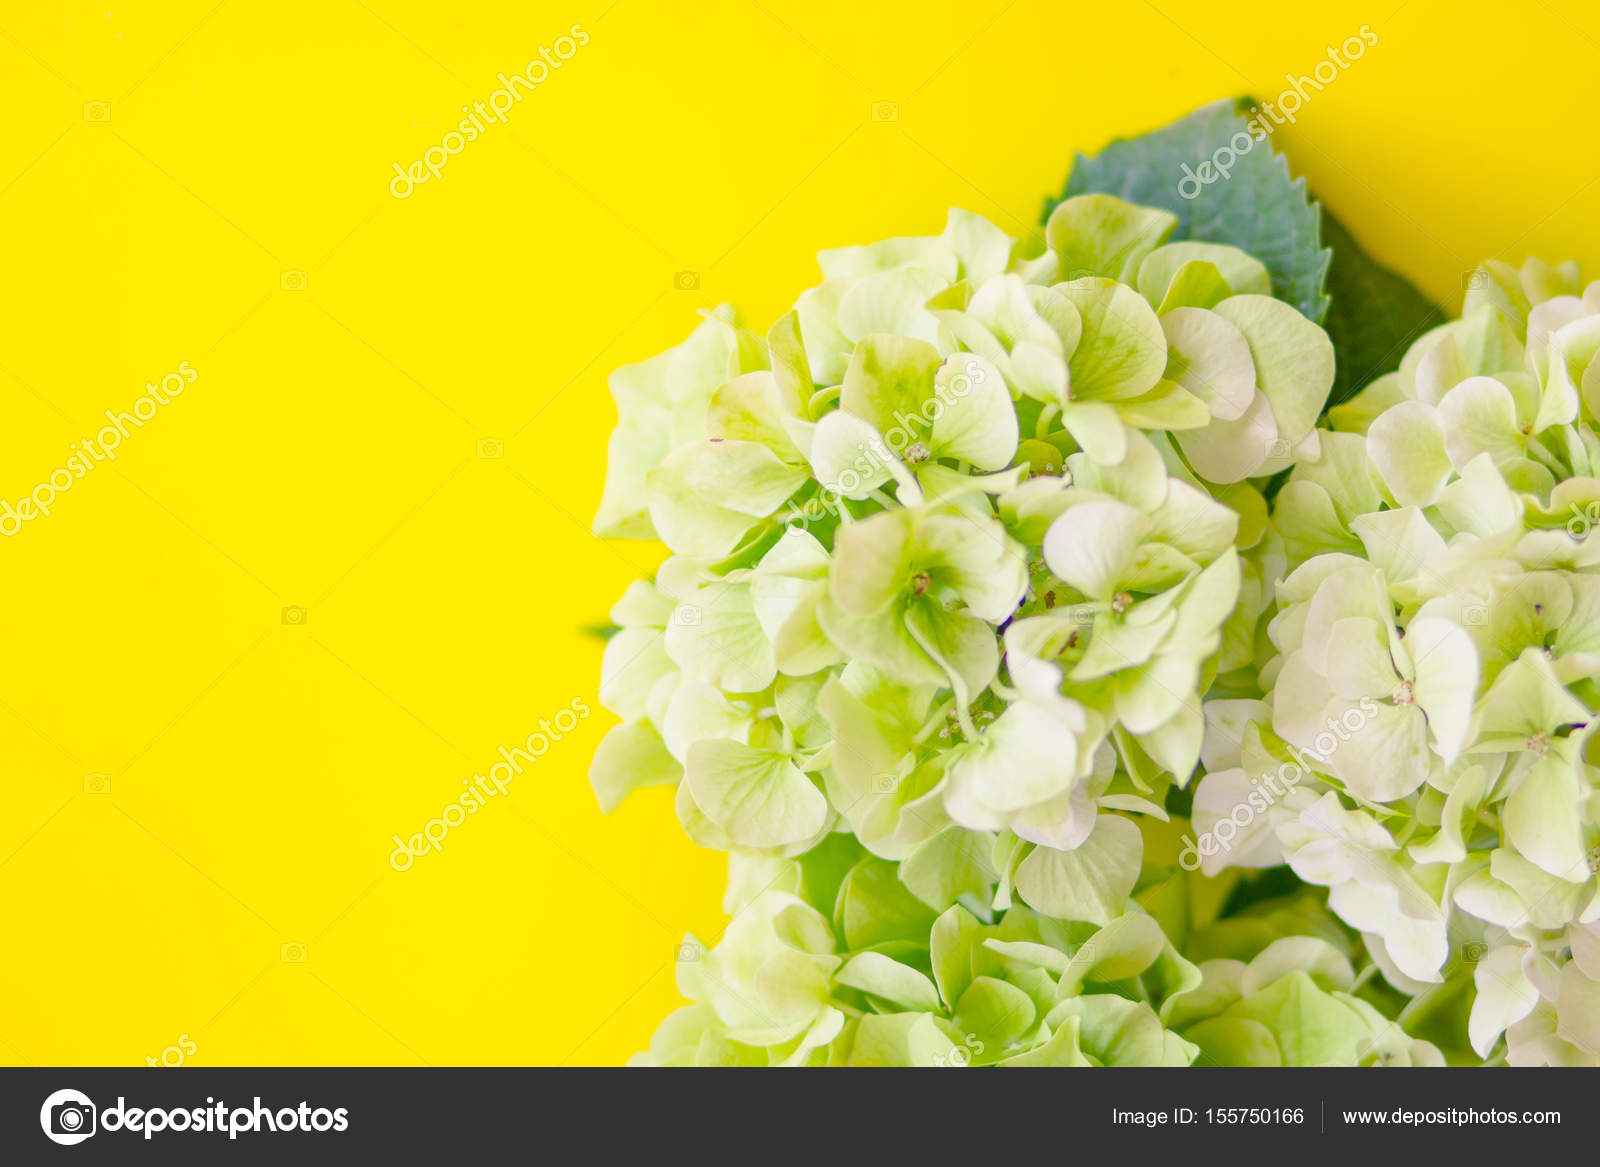 Hydrangea flowers on a yellow background stock photo lish26 hydrangea flowers on a yellow background stock photo mightylinksfo